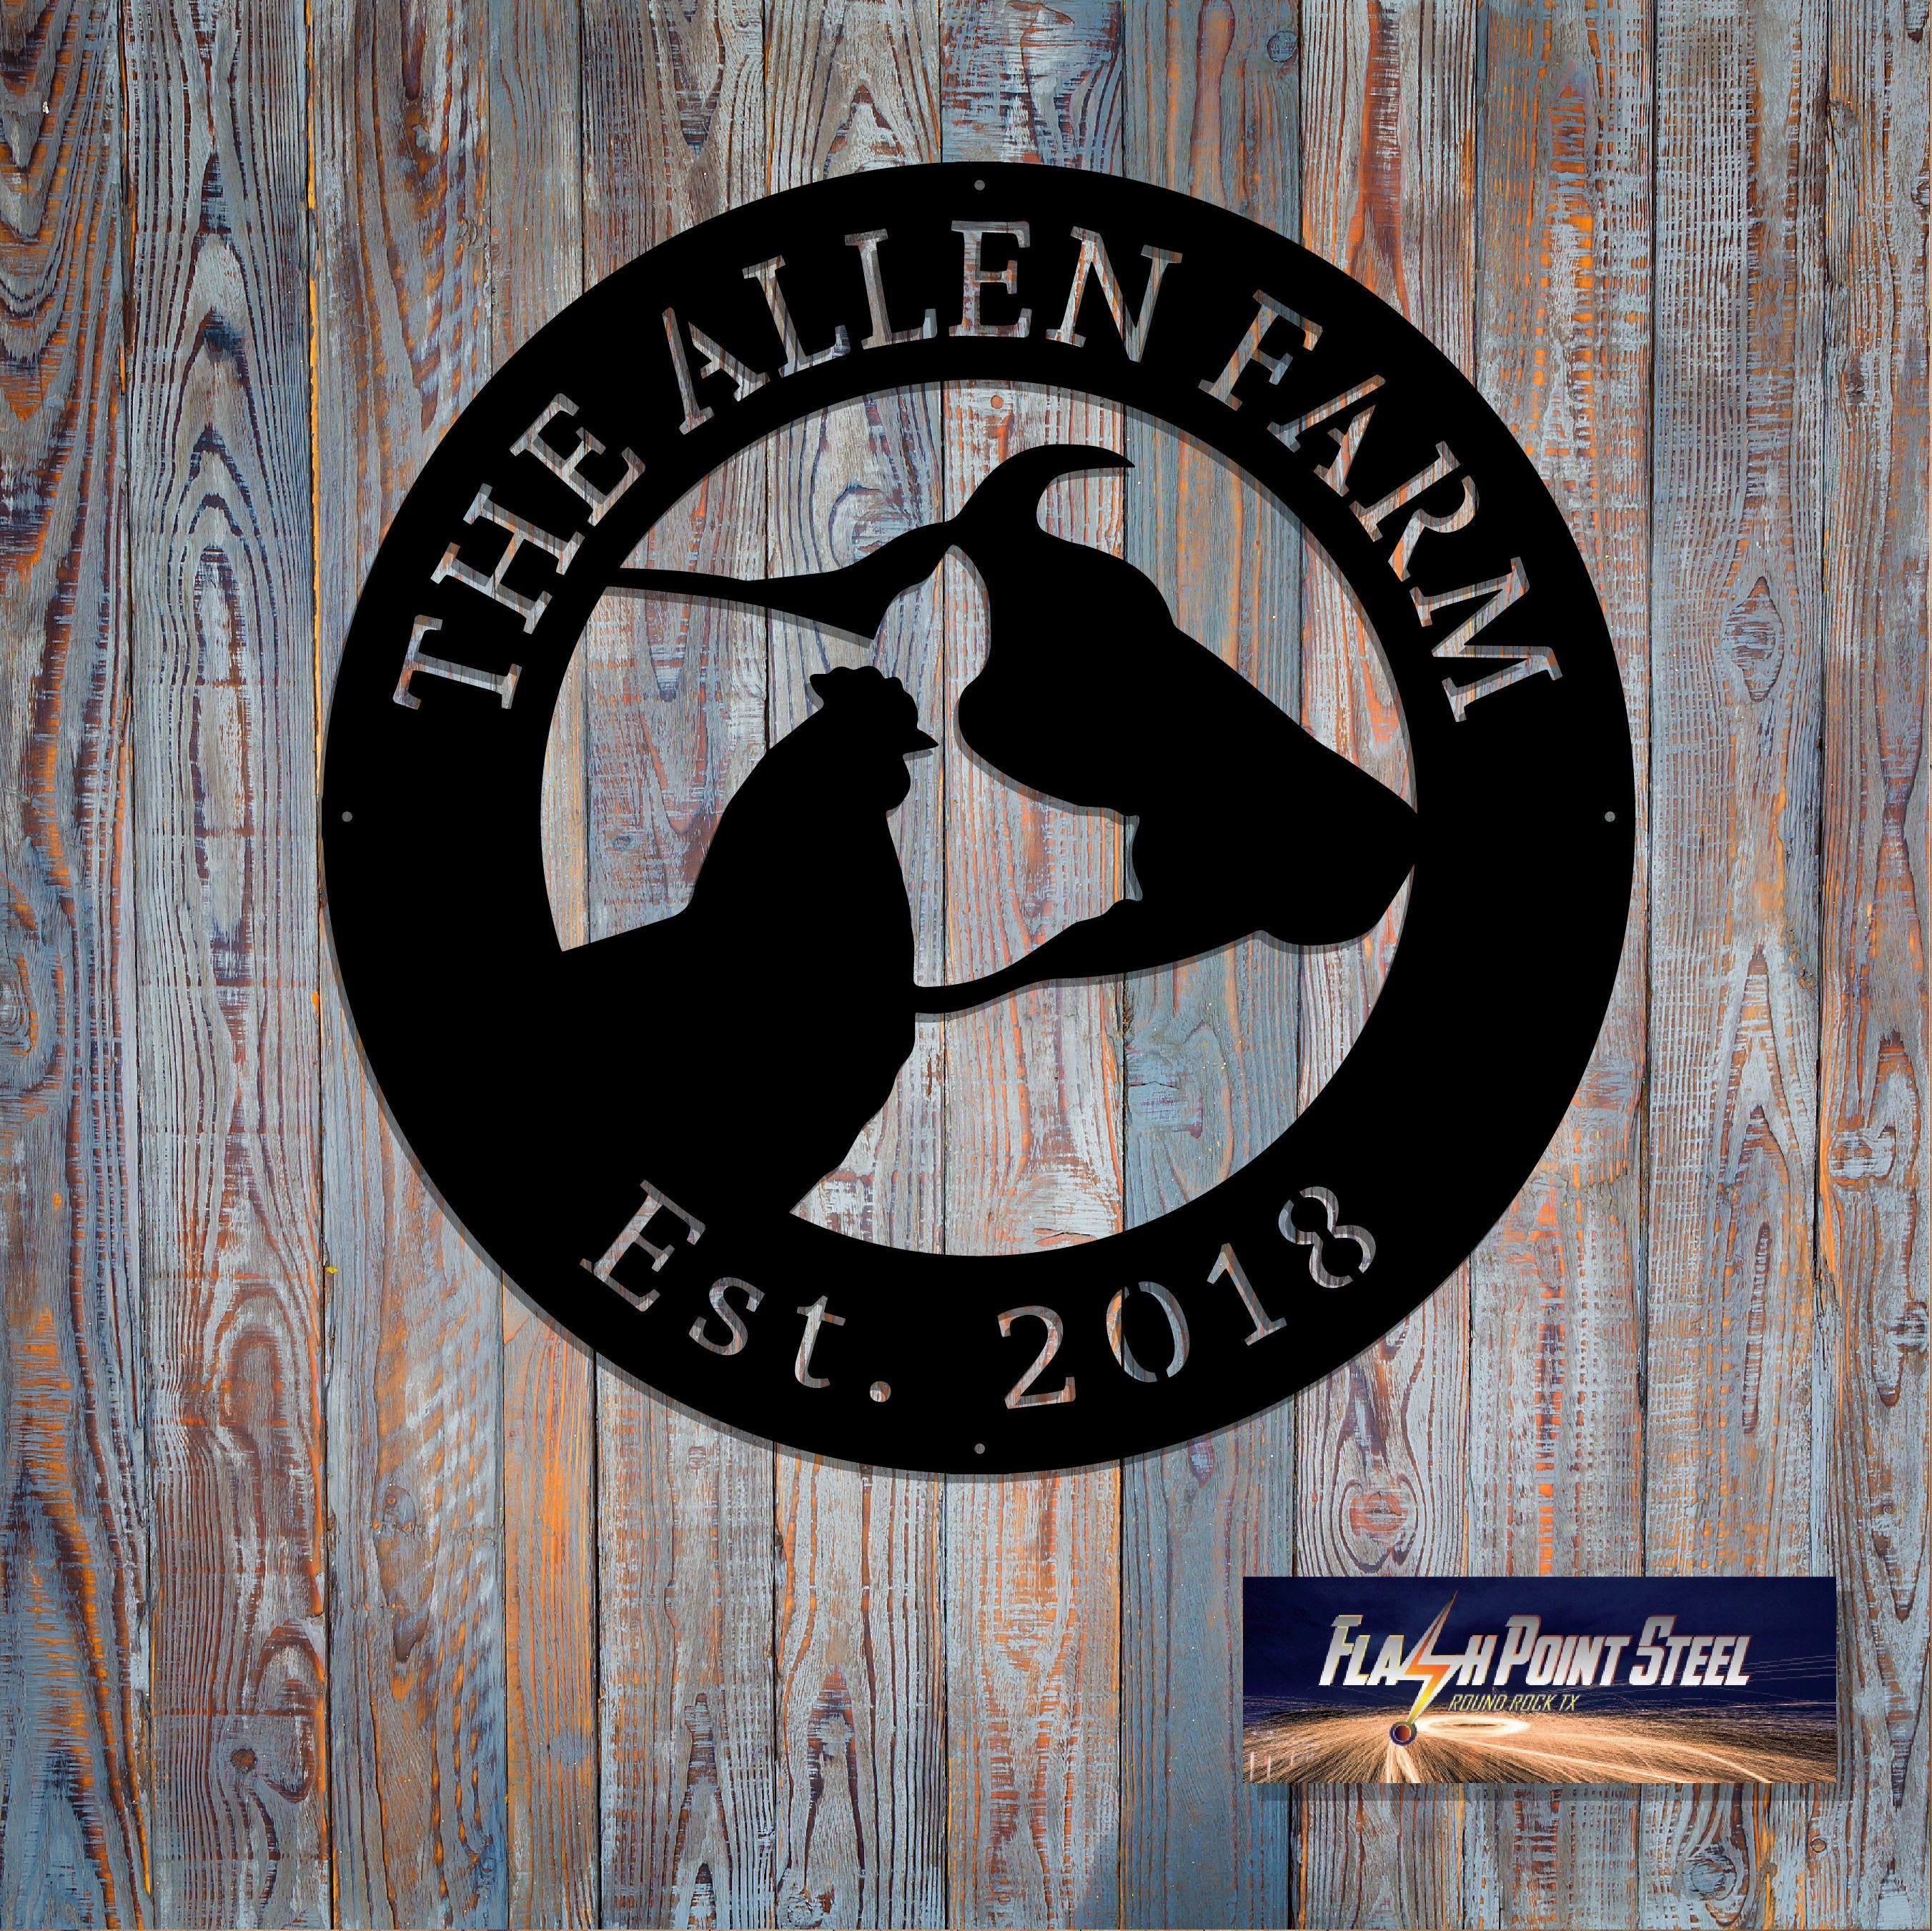 Animal Farm sign, Personalized, Customizable , Established, Plasma cut steel sign, cow, pig, chicken, animal farm sign, metal art, farmhouse